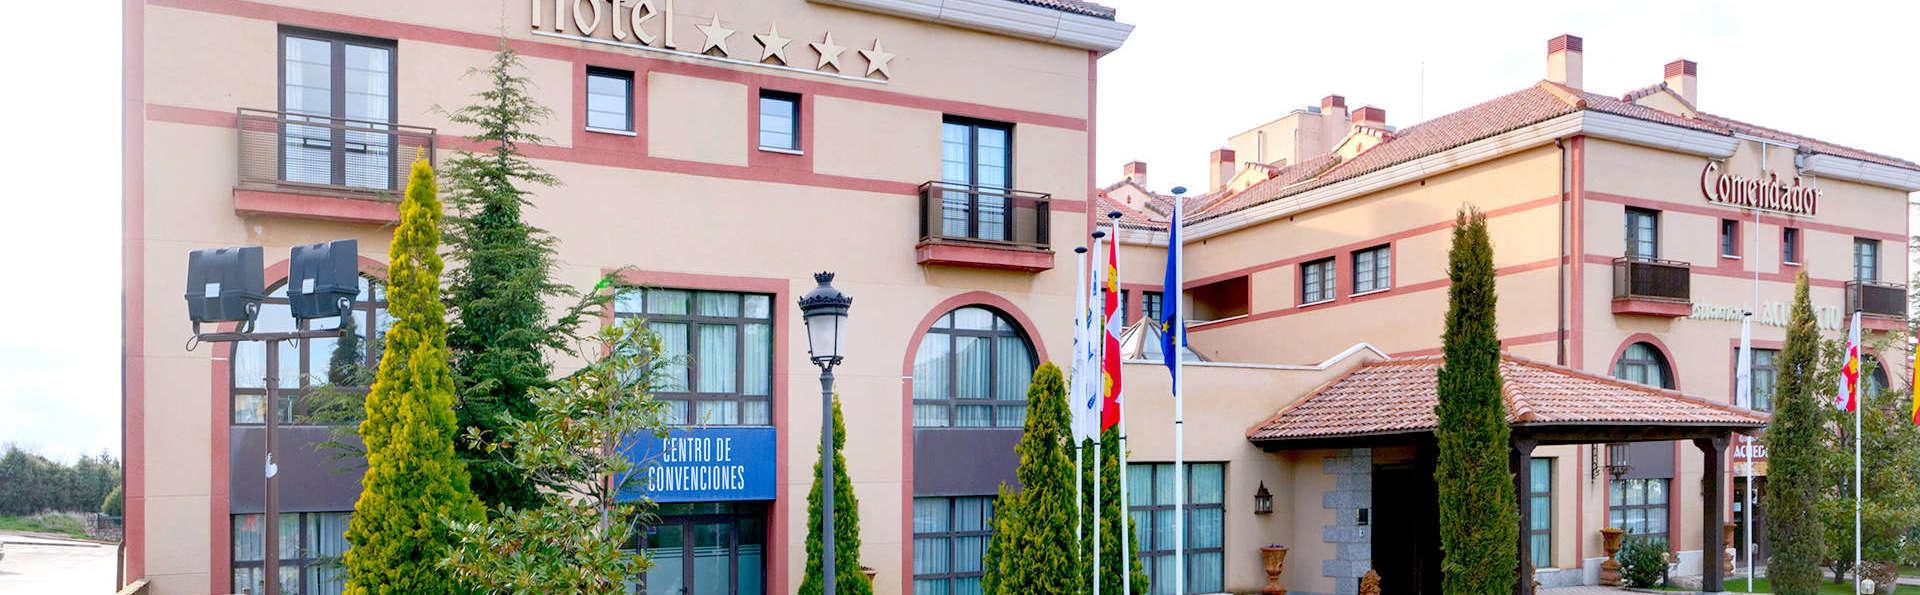 Hotel Segovia Sierra de Guadarrama - EDIT_FRONT1.jpg